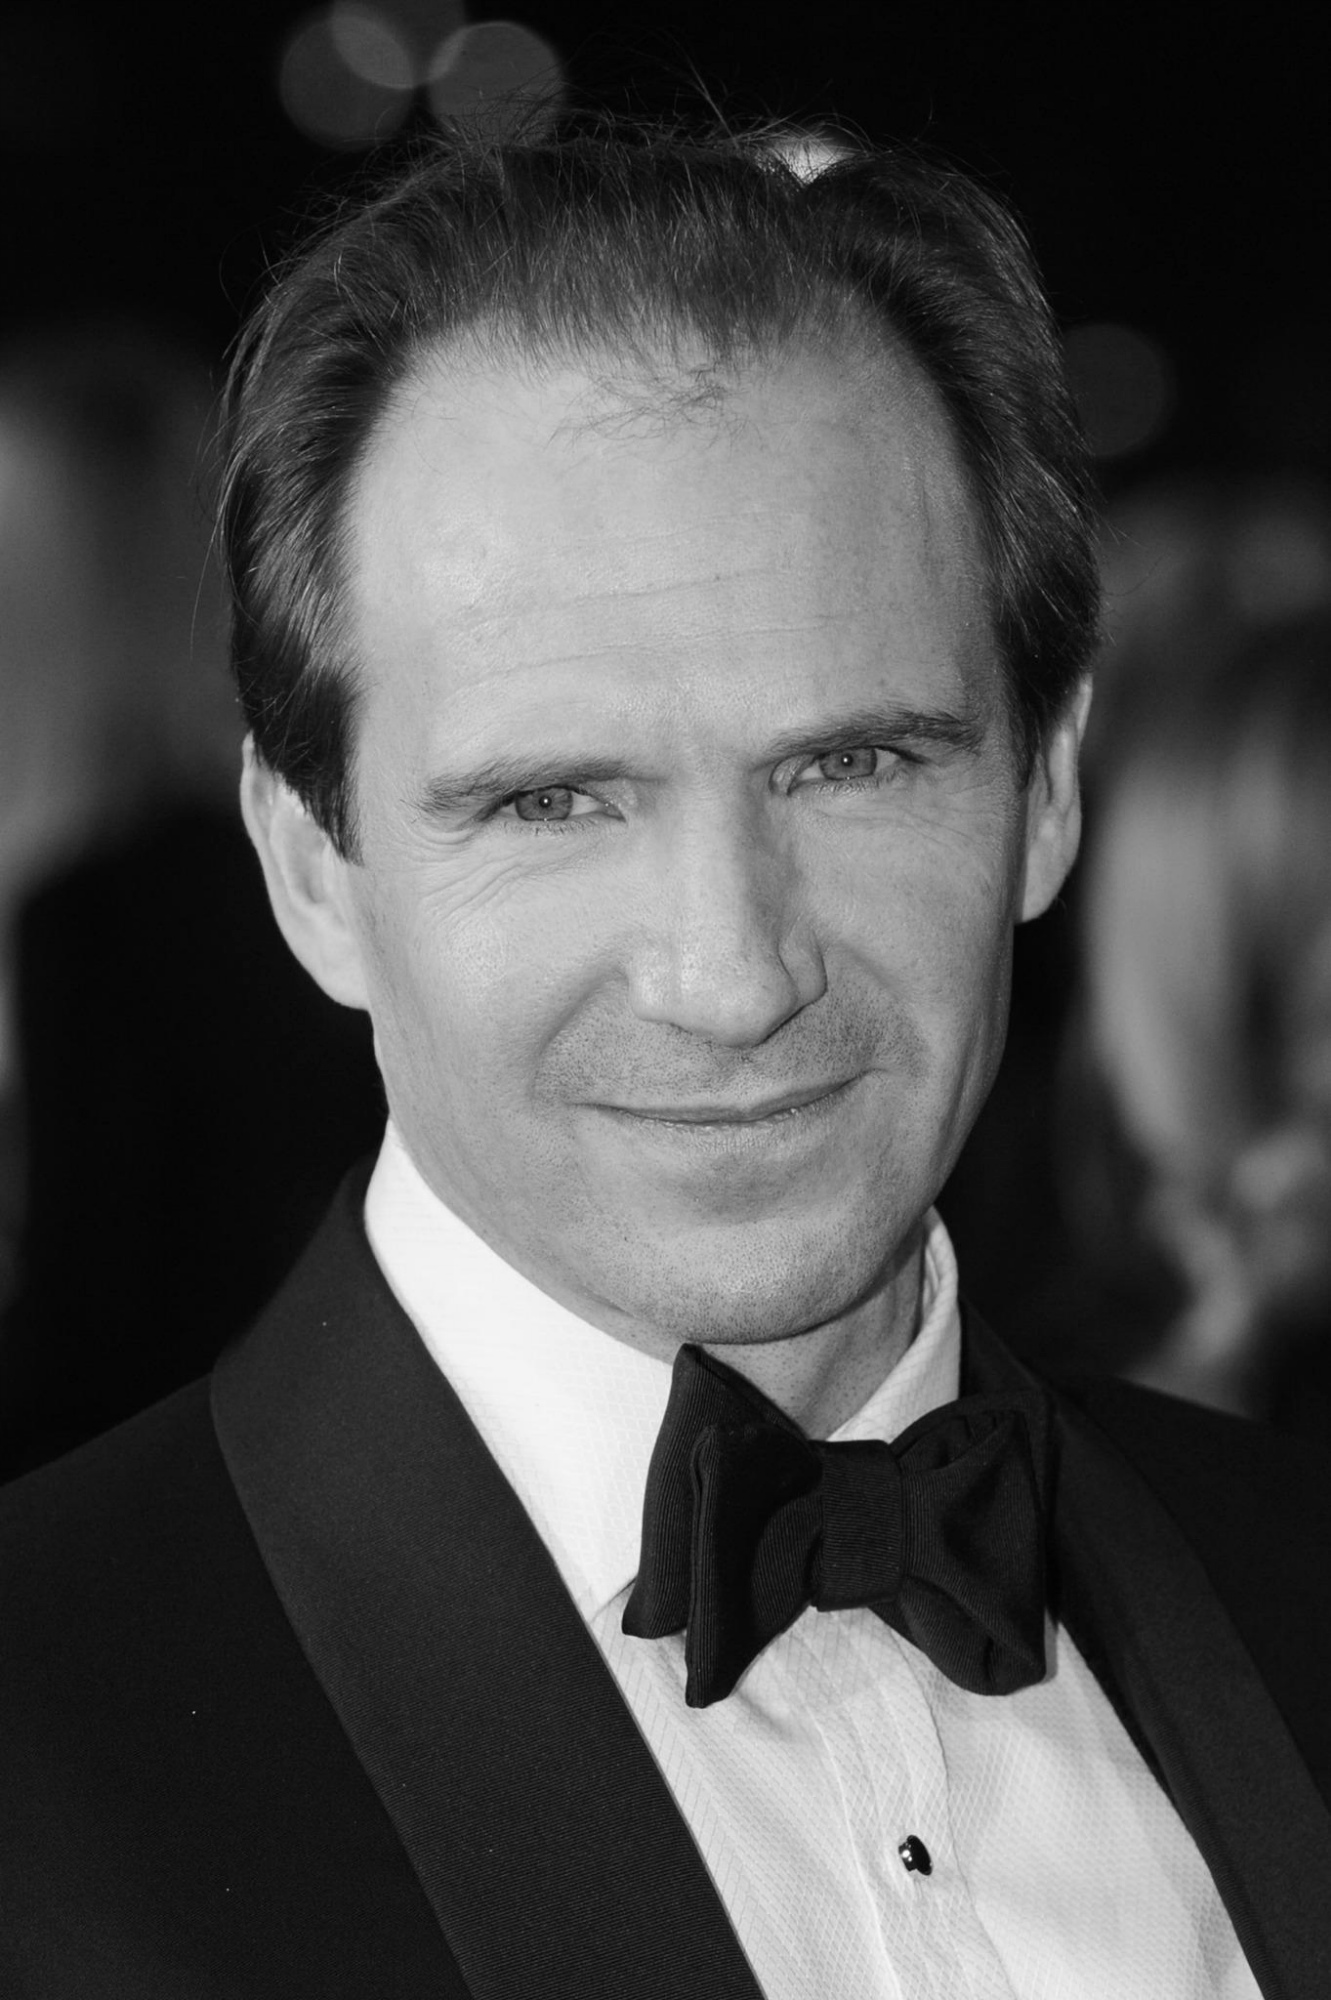 Ralph Fiennes - Wiki Harry Potter, l'encyclopédie sur Harry Potter Ralphfiennes